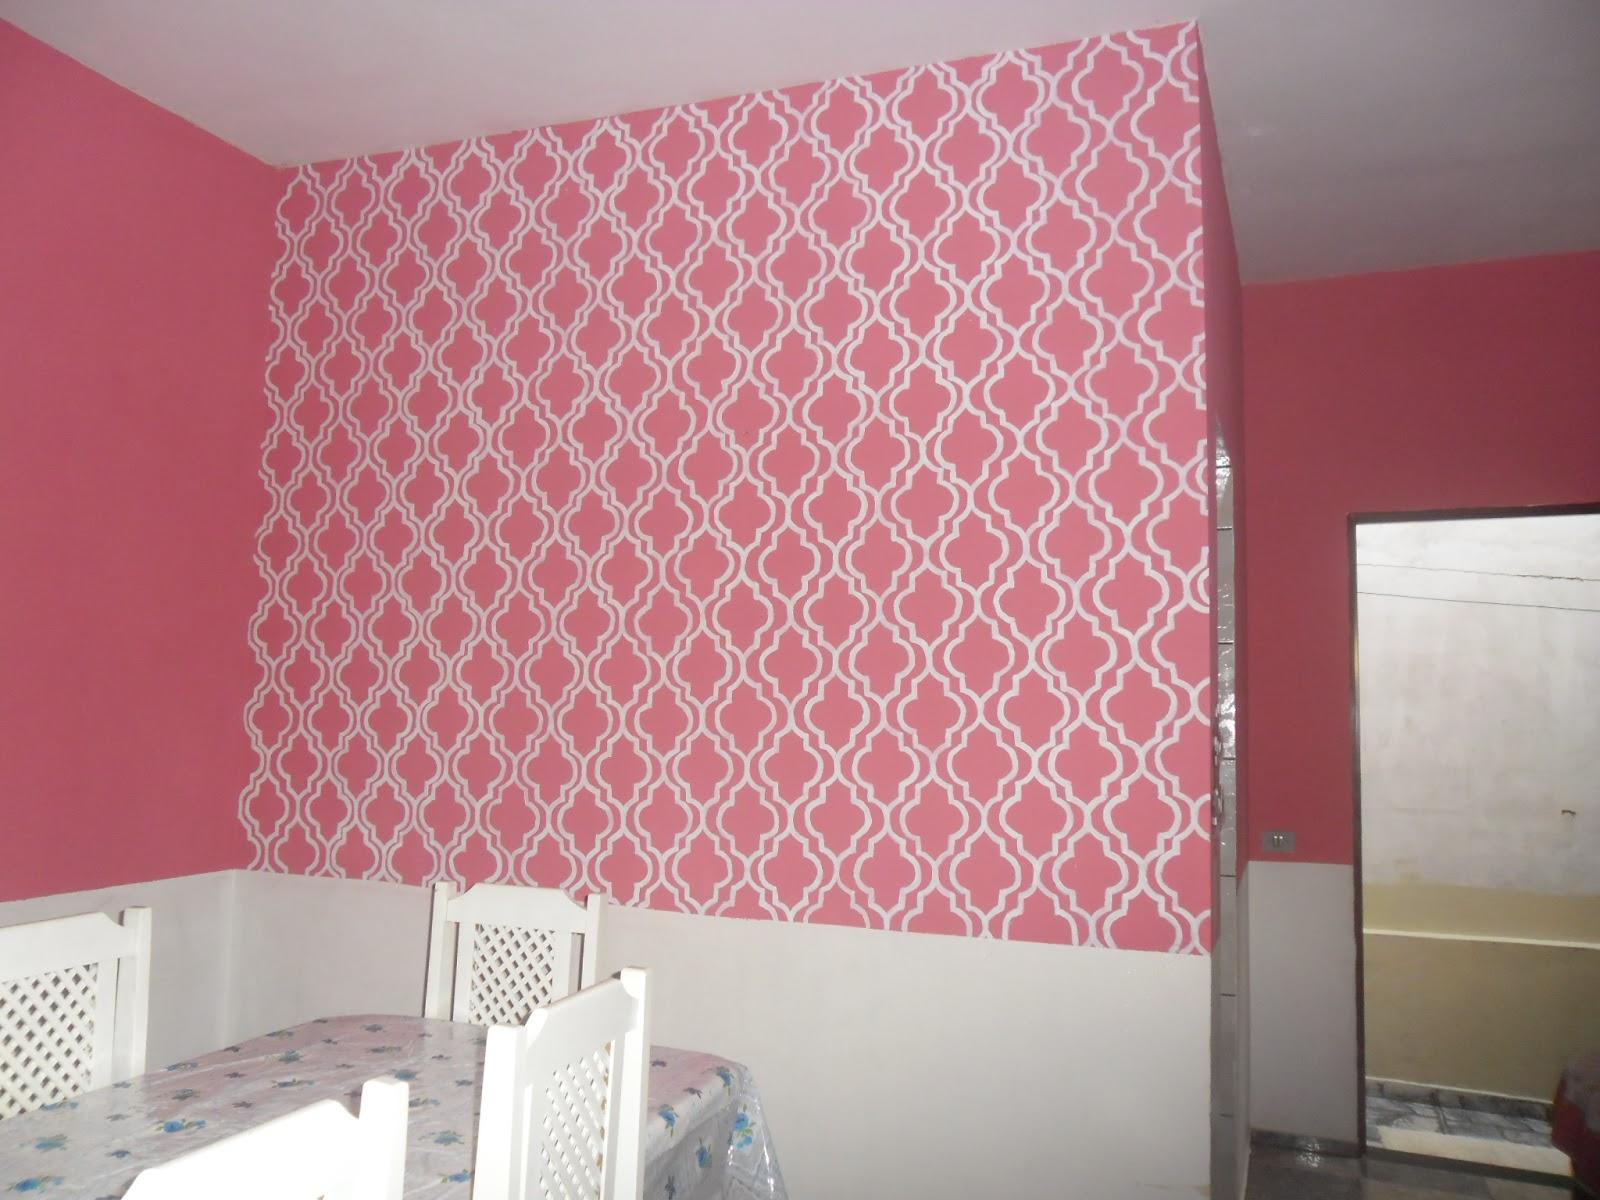 V mo l em casa decorando as paredes for Moda en pintura de paredes